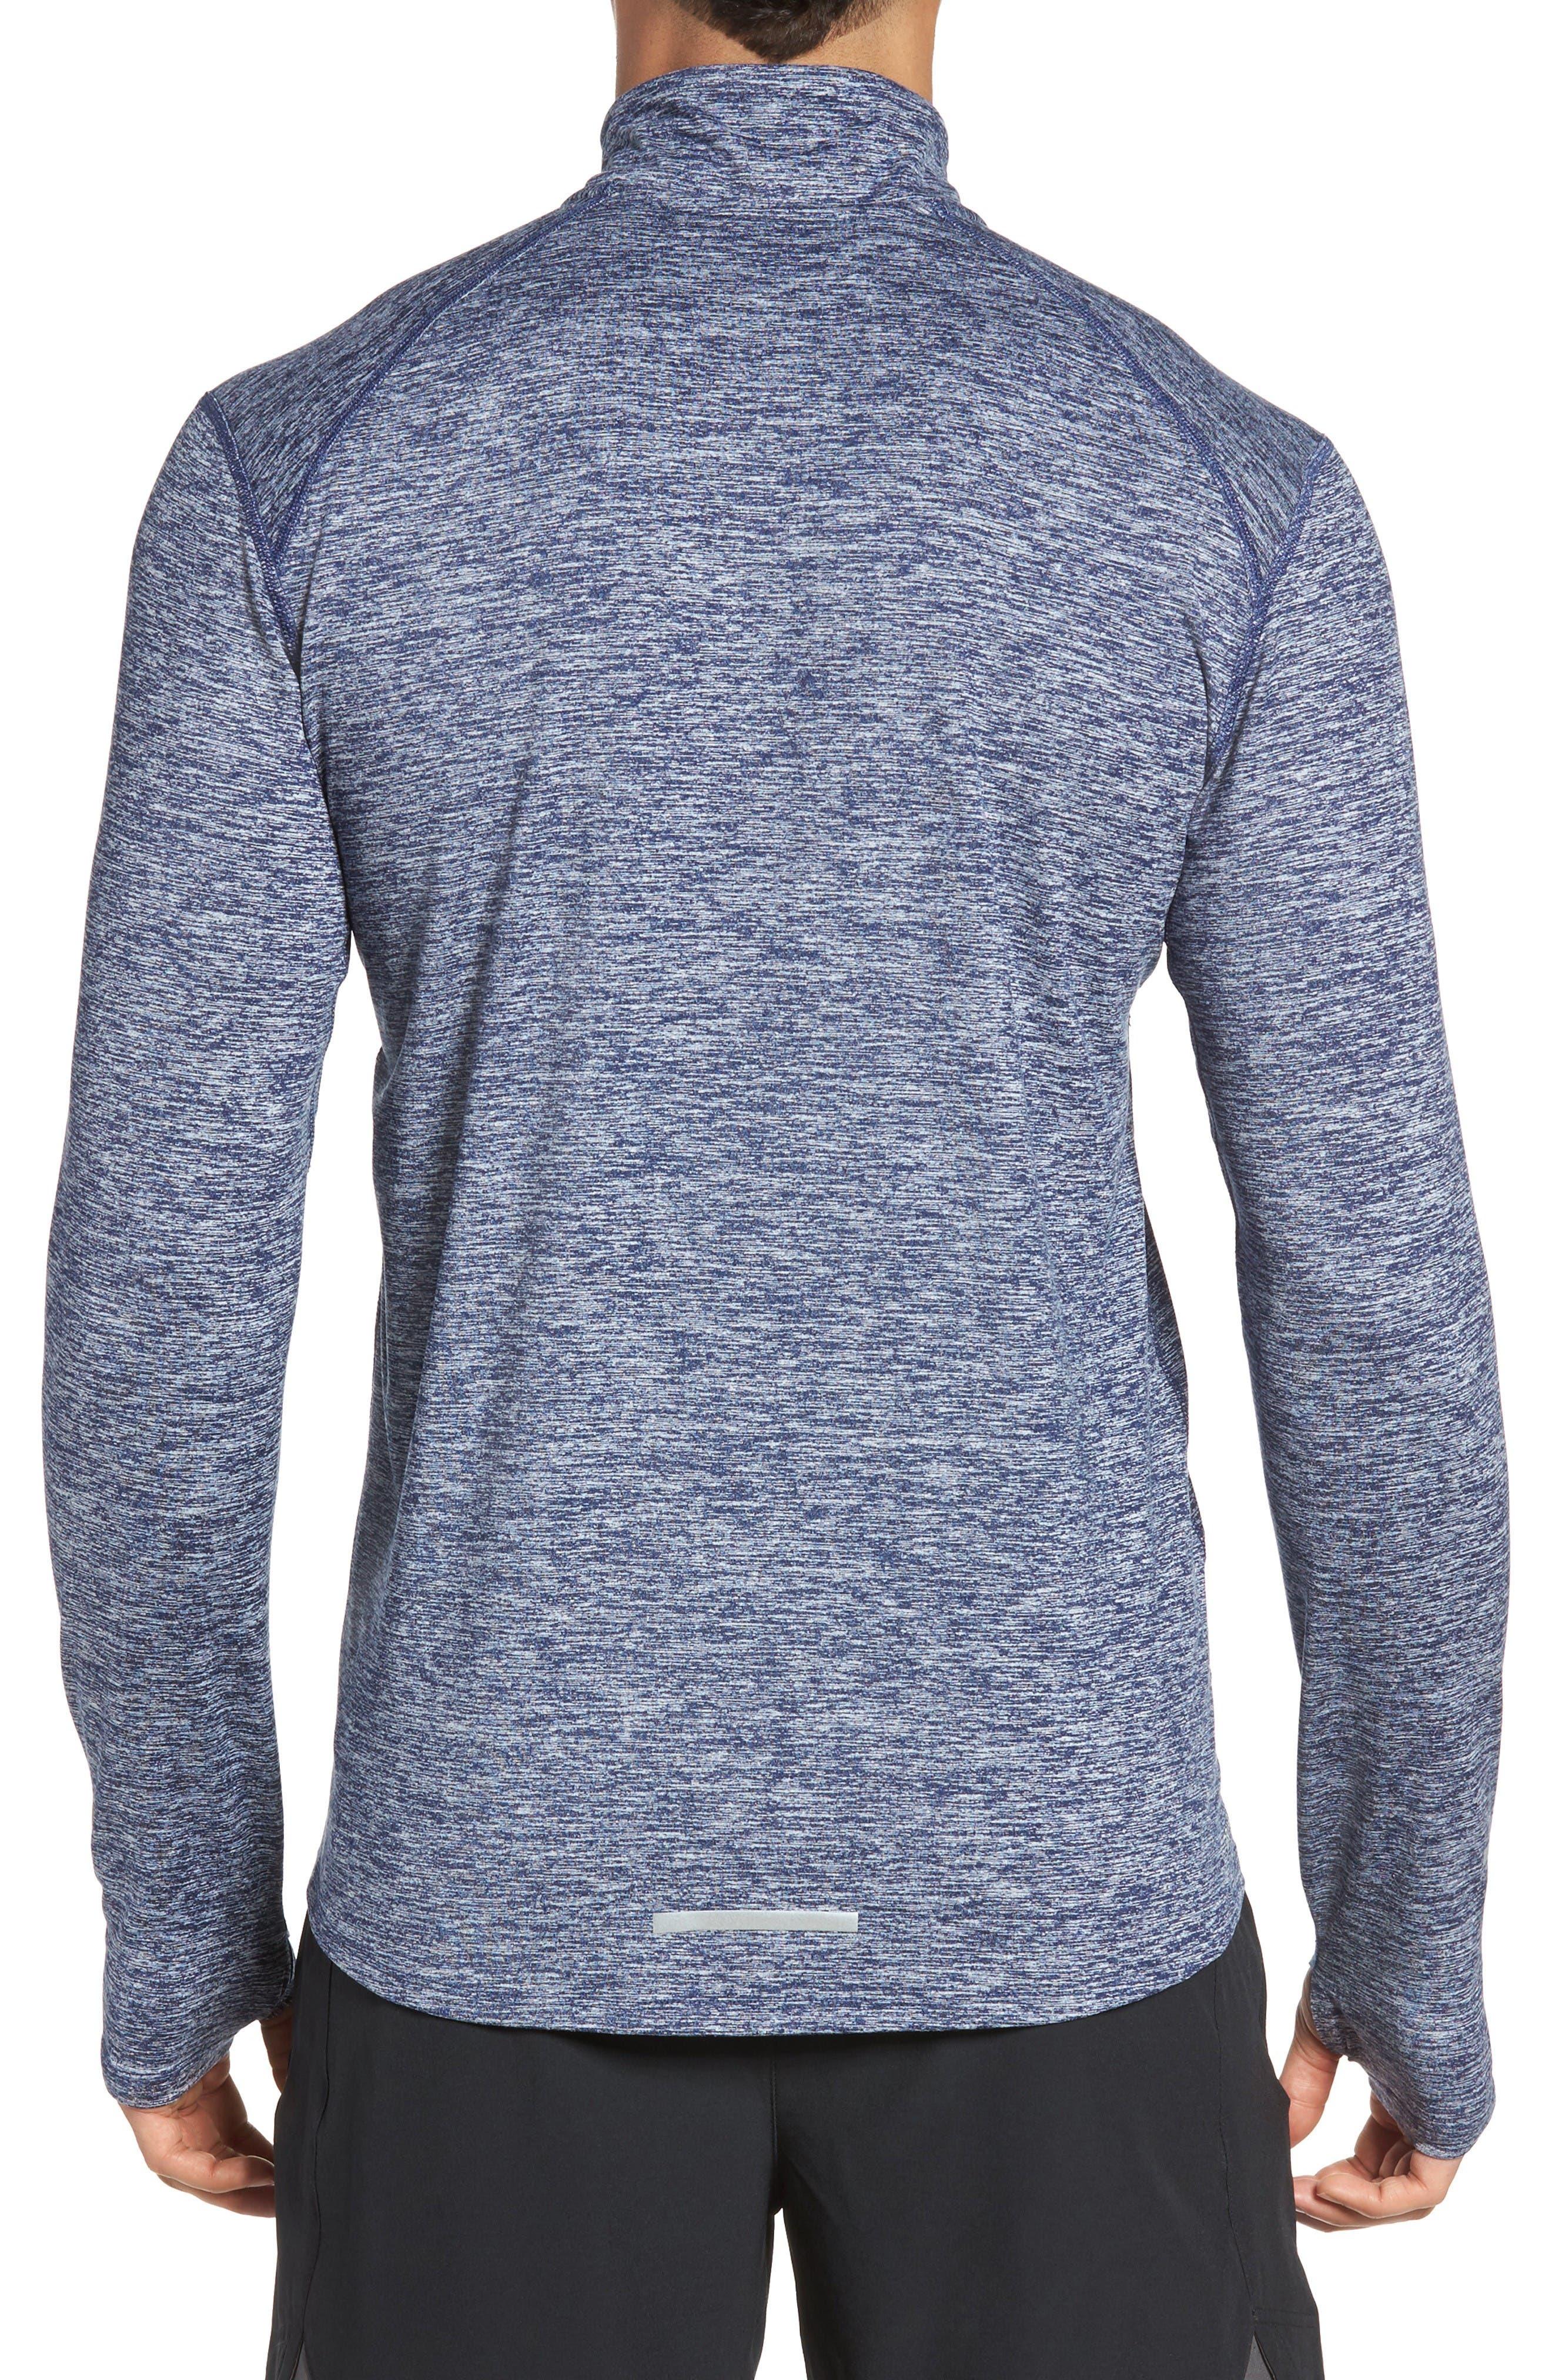 Alternate Image 2  - Nike 'Element' Dri-FIT Quarter Zip Running Top